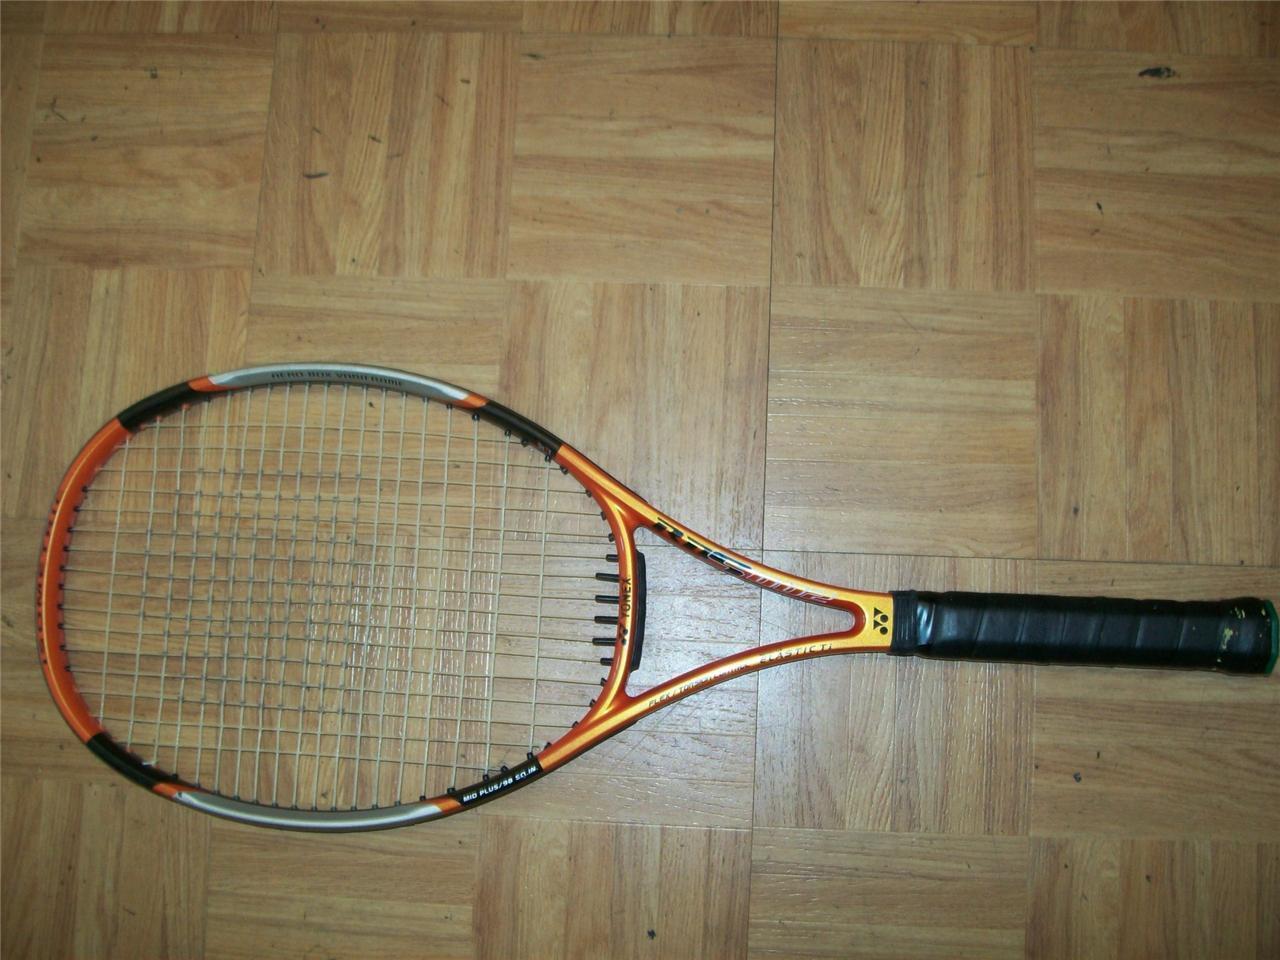 Yonex Rds 002 Midplus 98 cabeza 4 1 2 Grip Tenis Raqueta